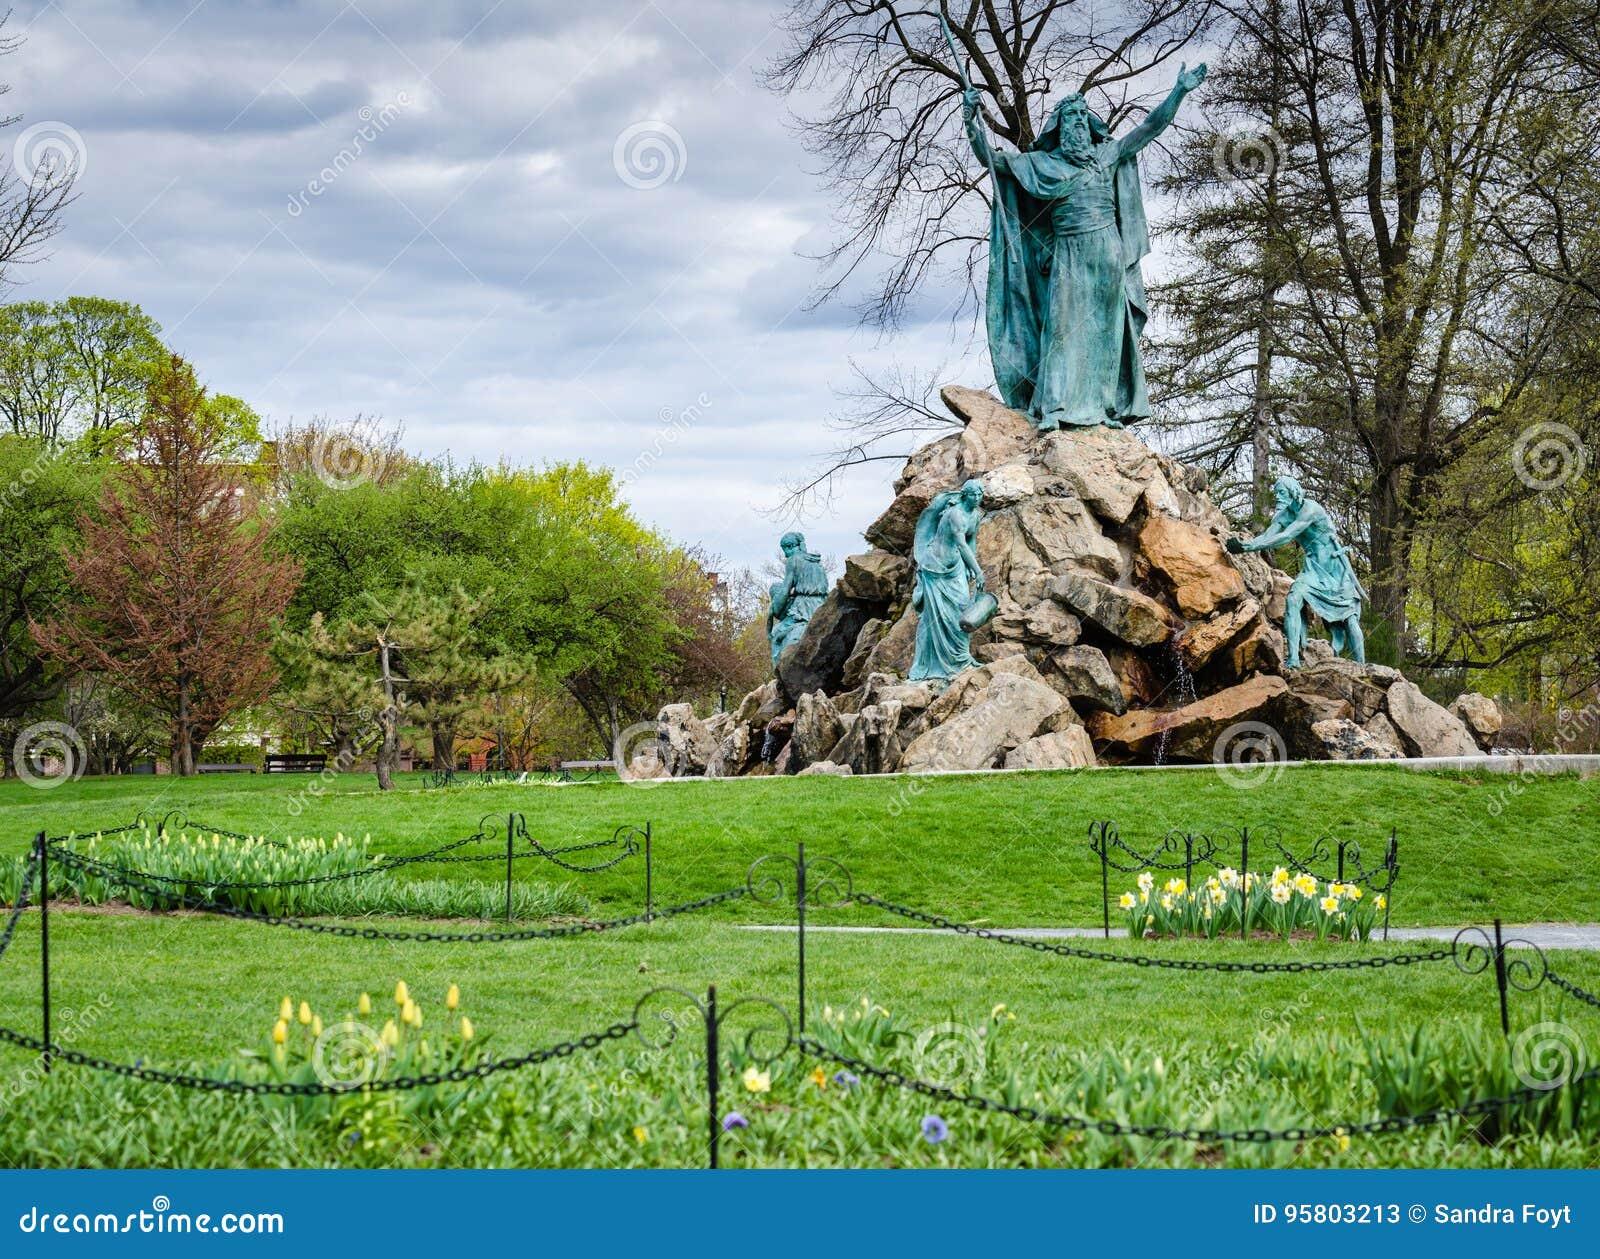 Konung Memorial Fountain - Washington Park - Albany, New York